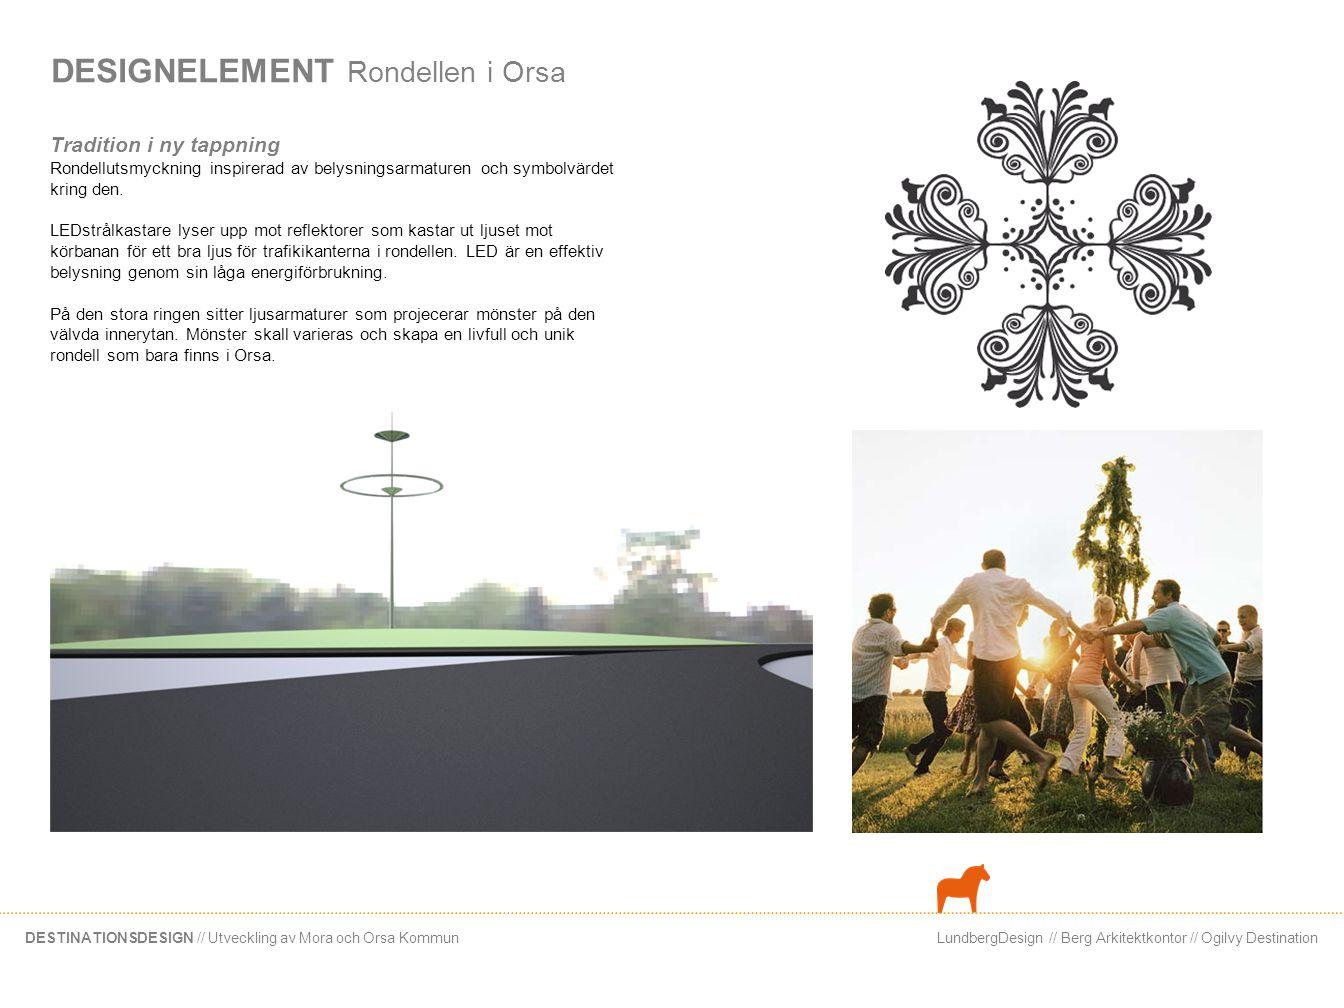 LundbergDesign // Berg Arkitektkontor // Ogilvy DestinationDESTINATIONSDESIGN // Utveckling av Mora och Orsa Kommun DESIGNELEMENT Rondellen i Orsa Tra